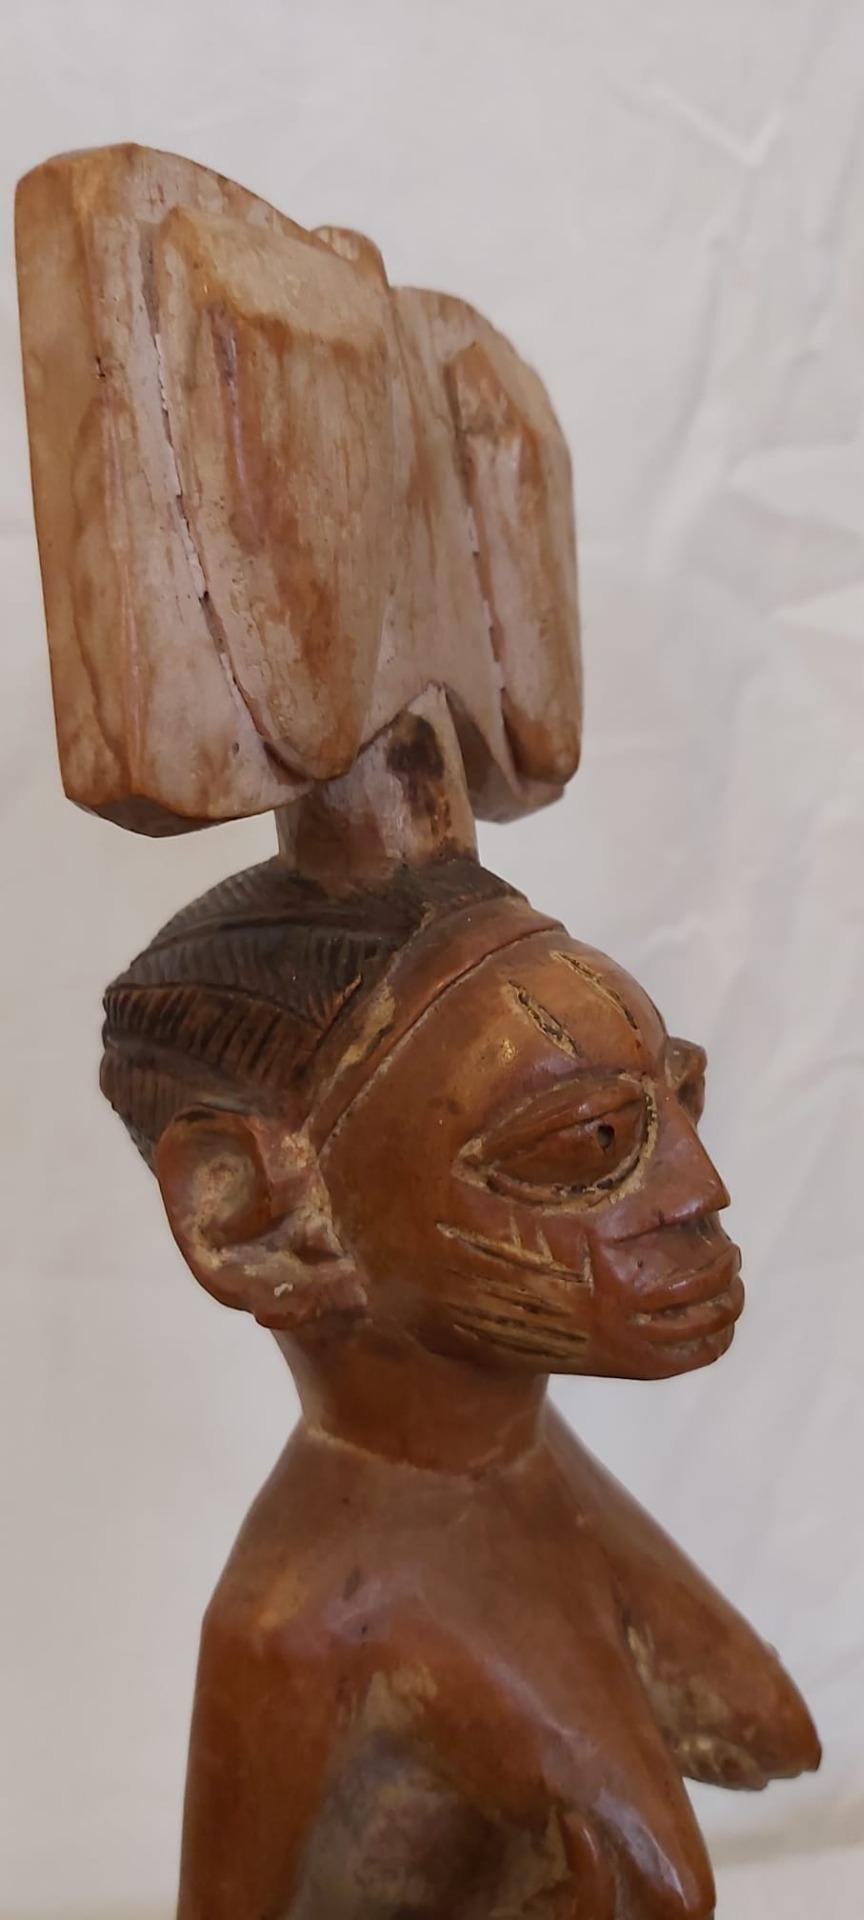 thumb4|Scettro Yoruba (Nigeria)  epoca 1940/50